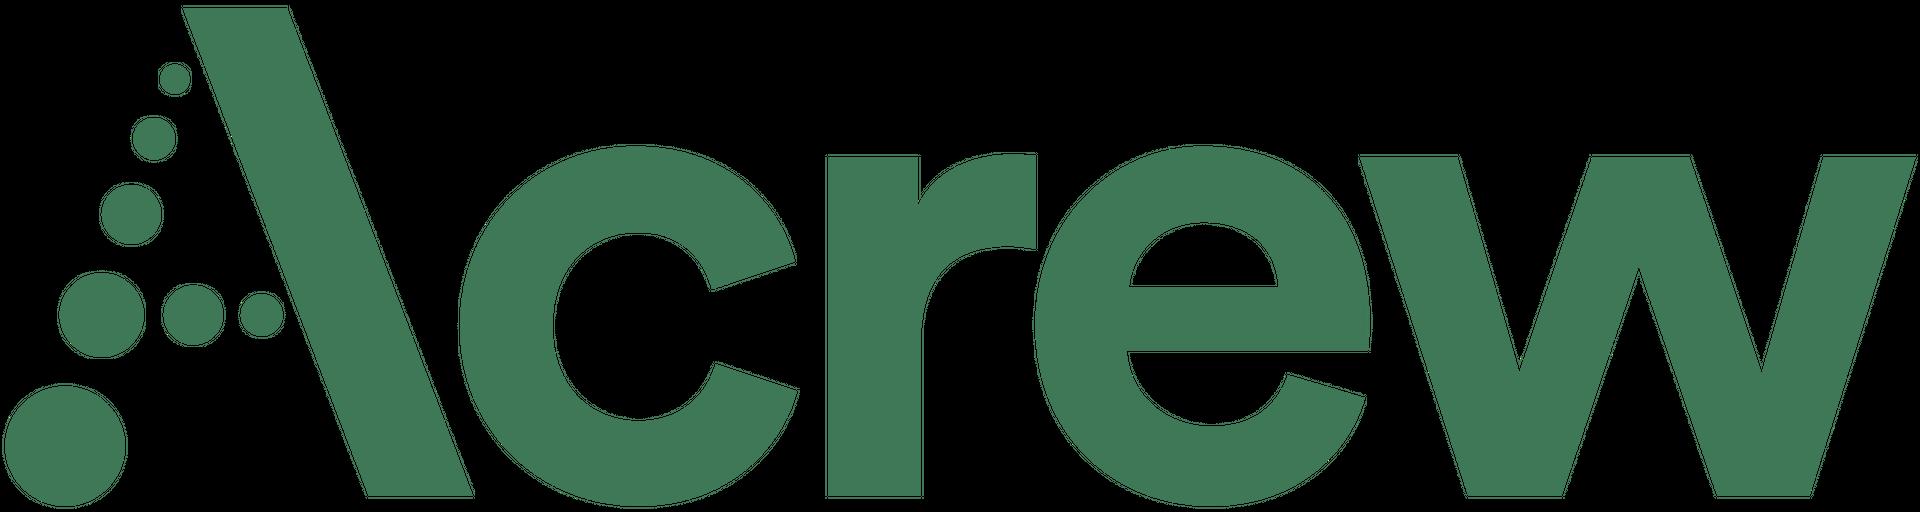 acrew capital logo green png